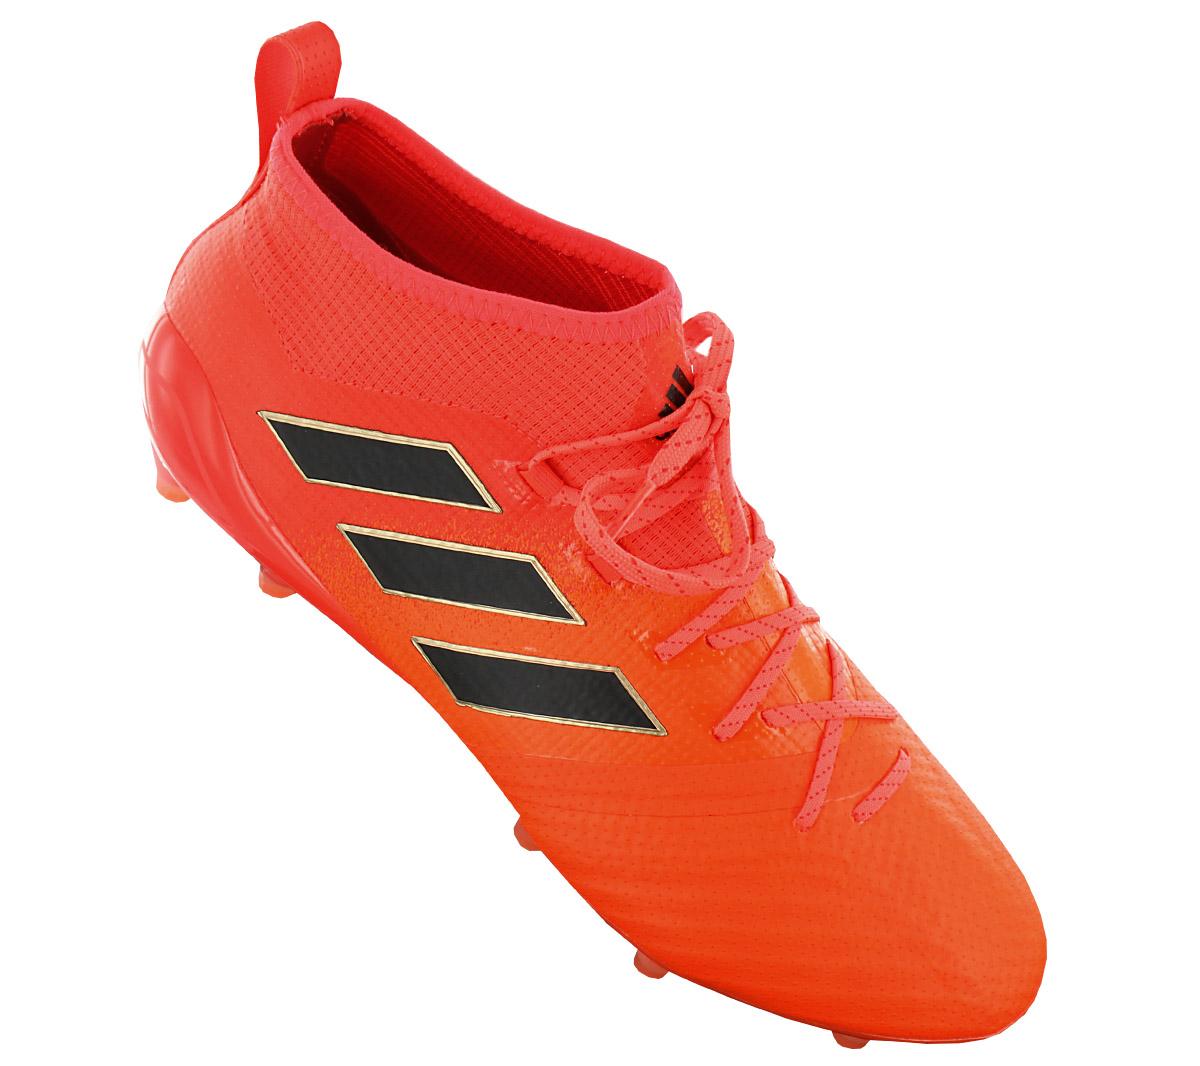 d1ee920e5bd Adidas Ace 17.1 Fg